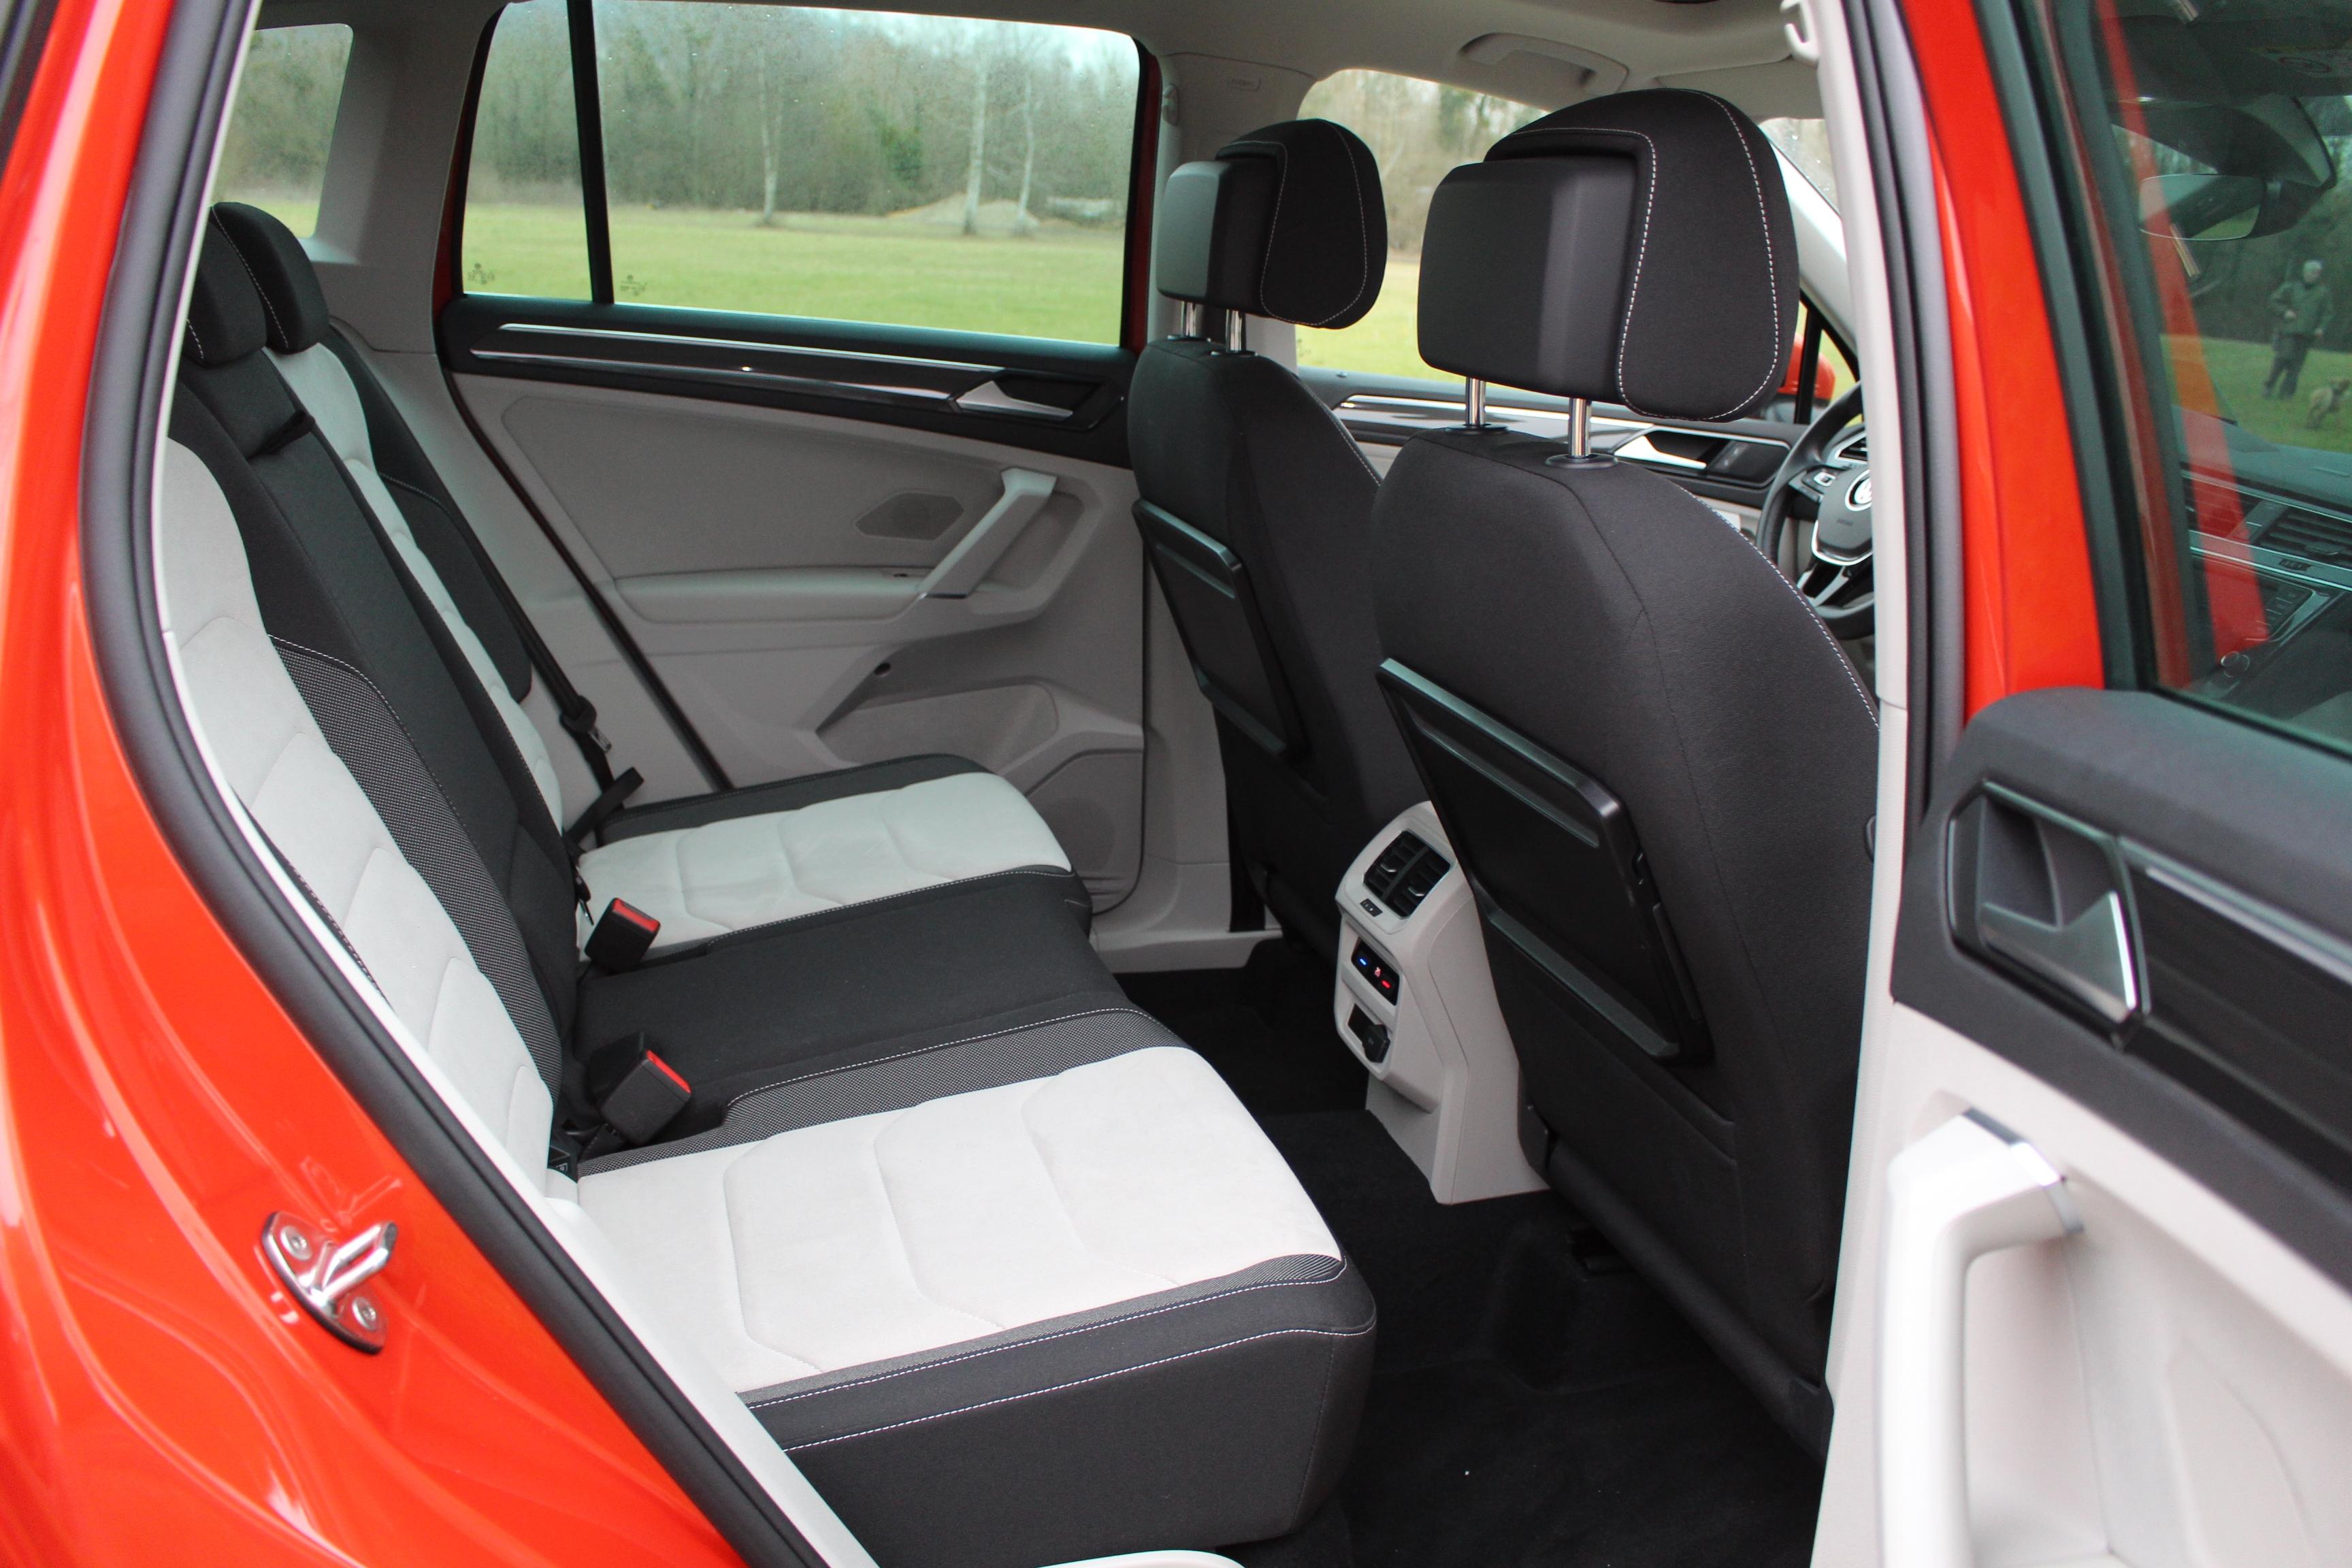 essai volkswagen tiguan 1 4 tsi 150 act 2017 l 39 essence en veil. Black Bedroom Furniture Sets. Home Design Ideas